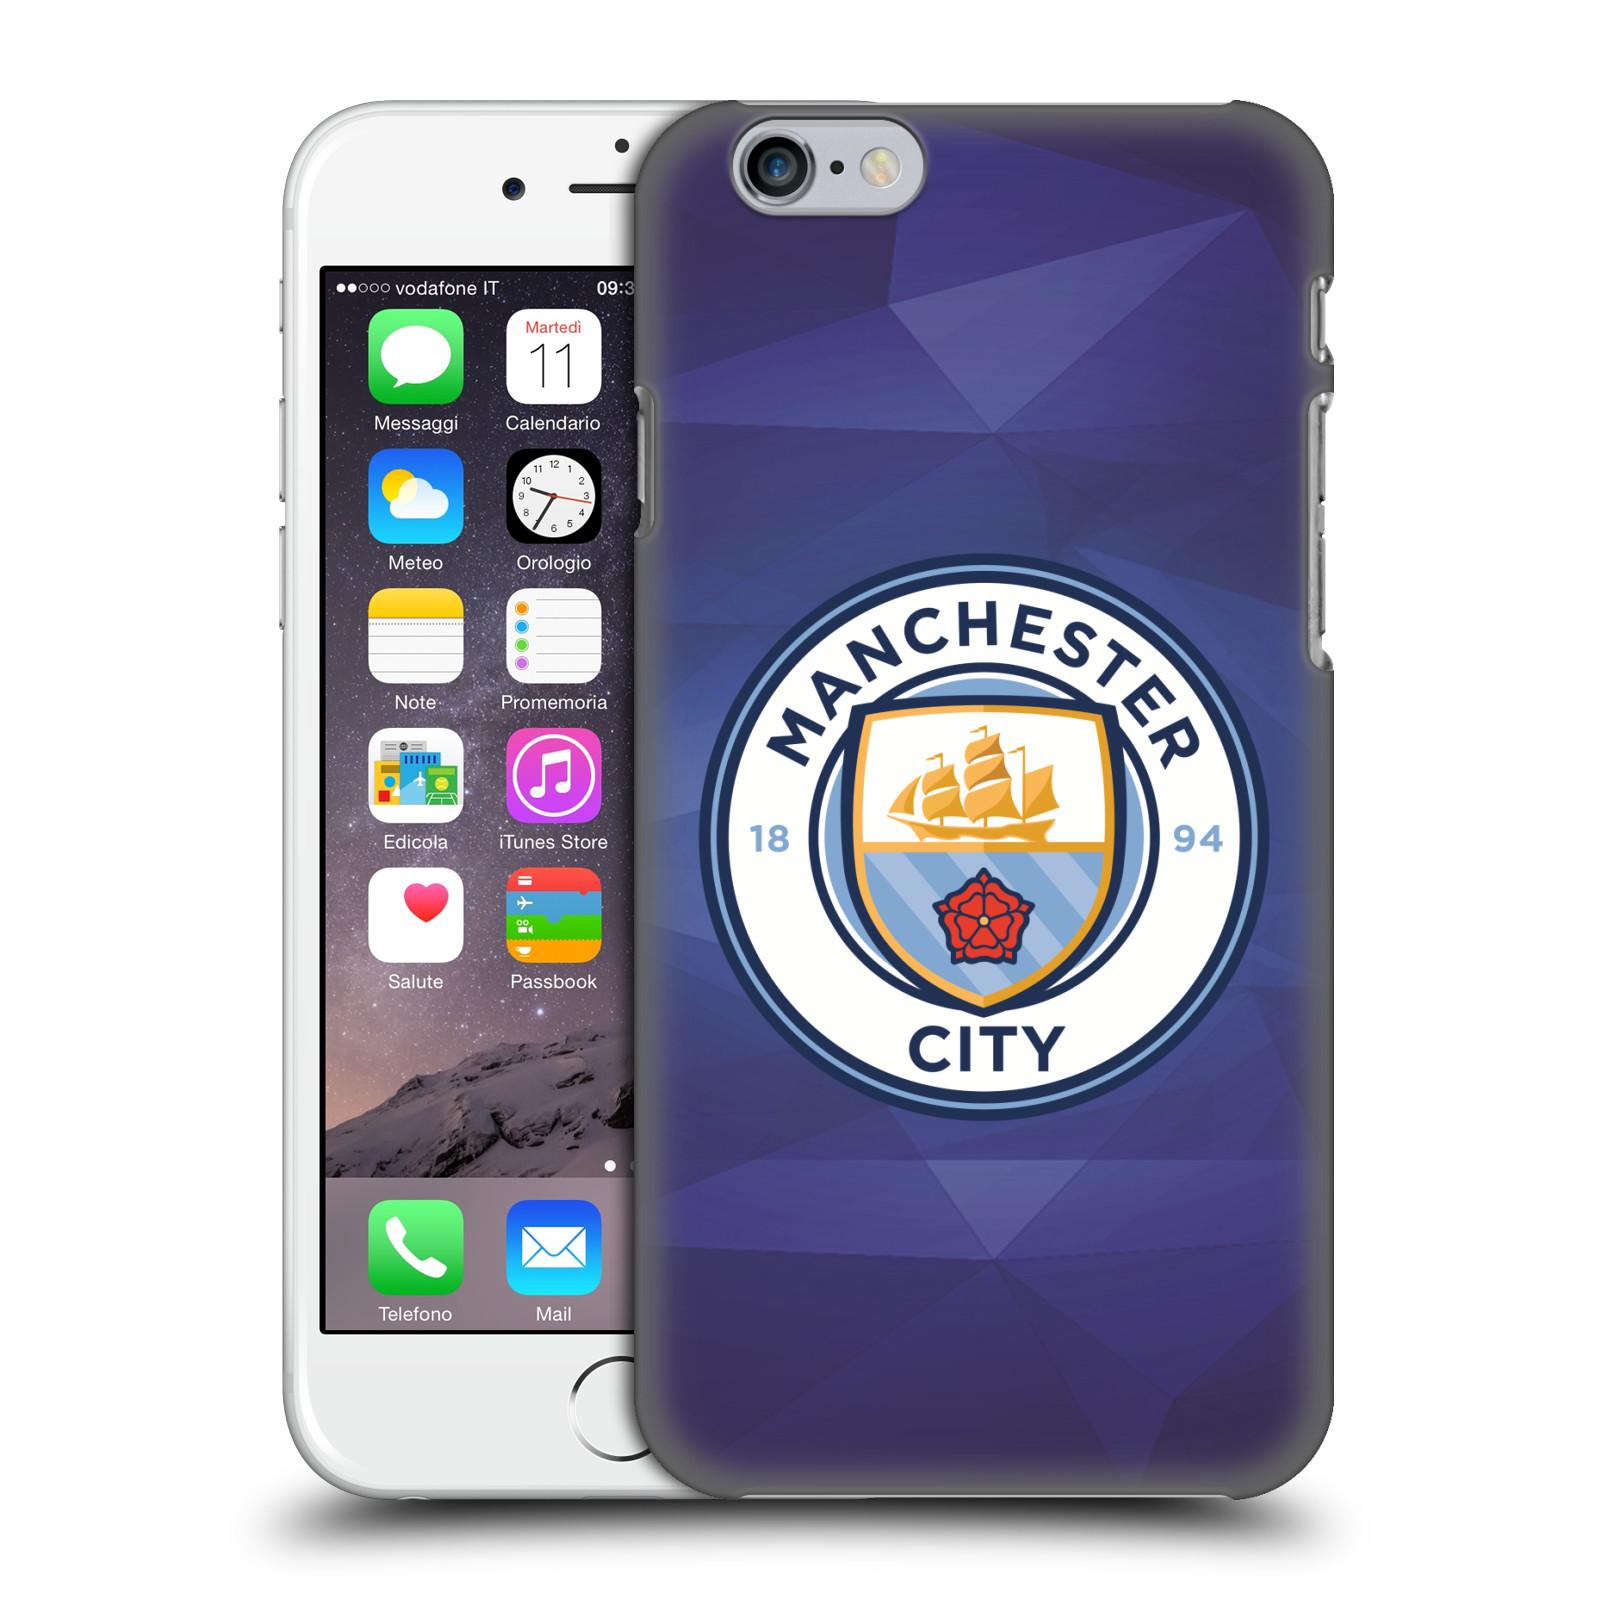 Plastové pouzdro na mobil Apple iPhone 6 HEAD CASE Manchester City FC - Modré nové logo